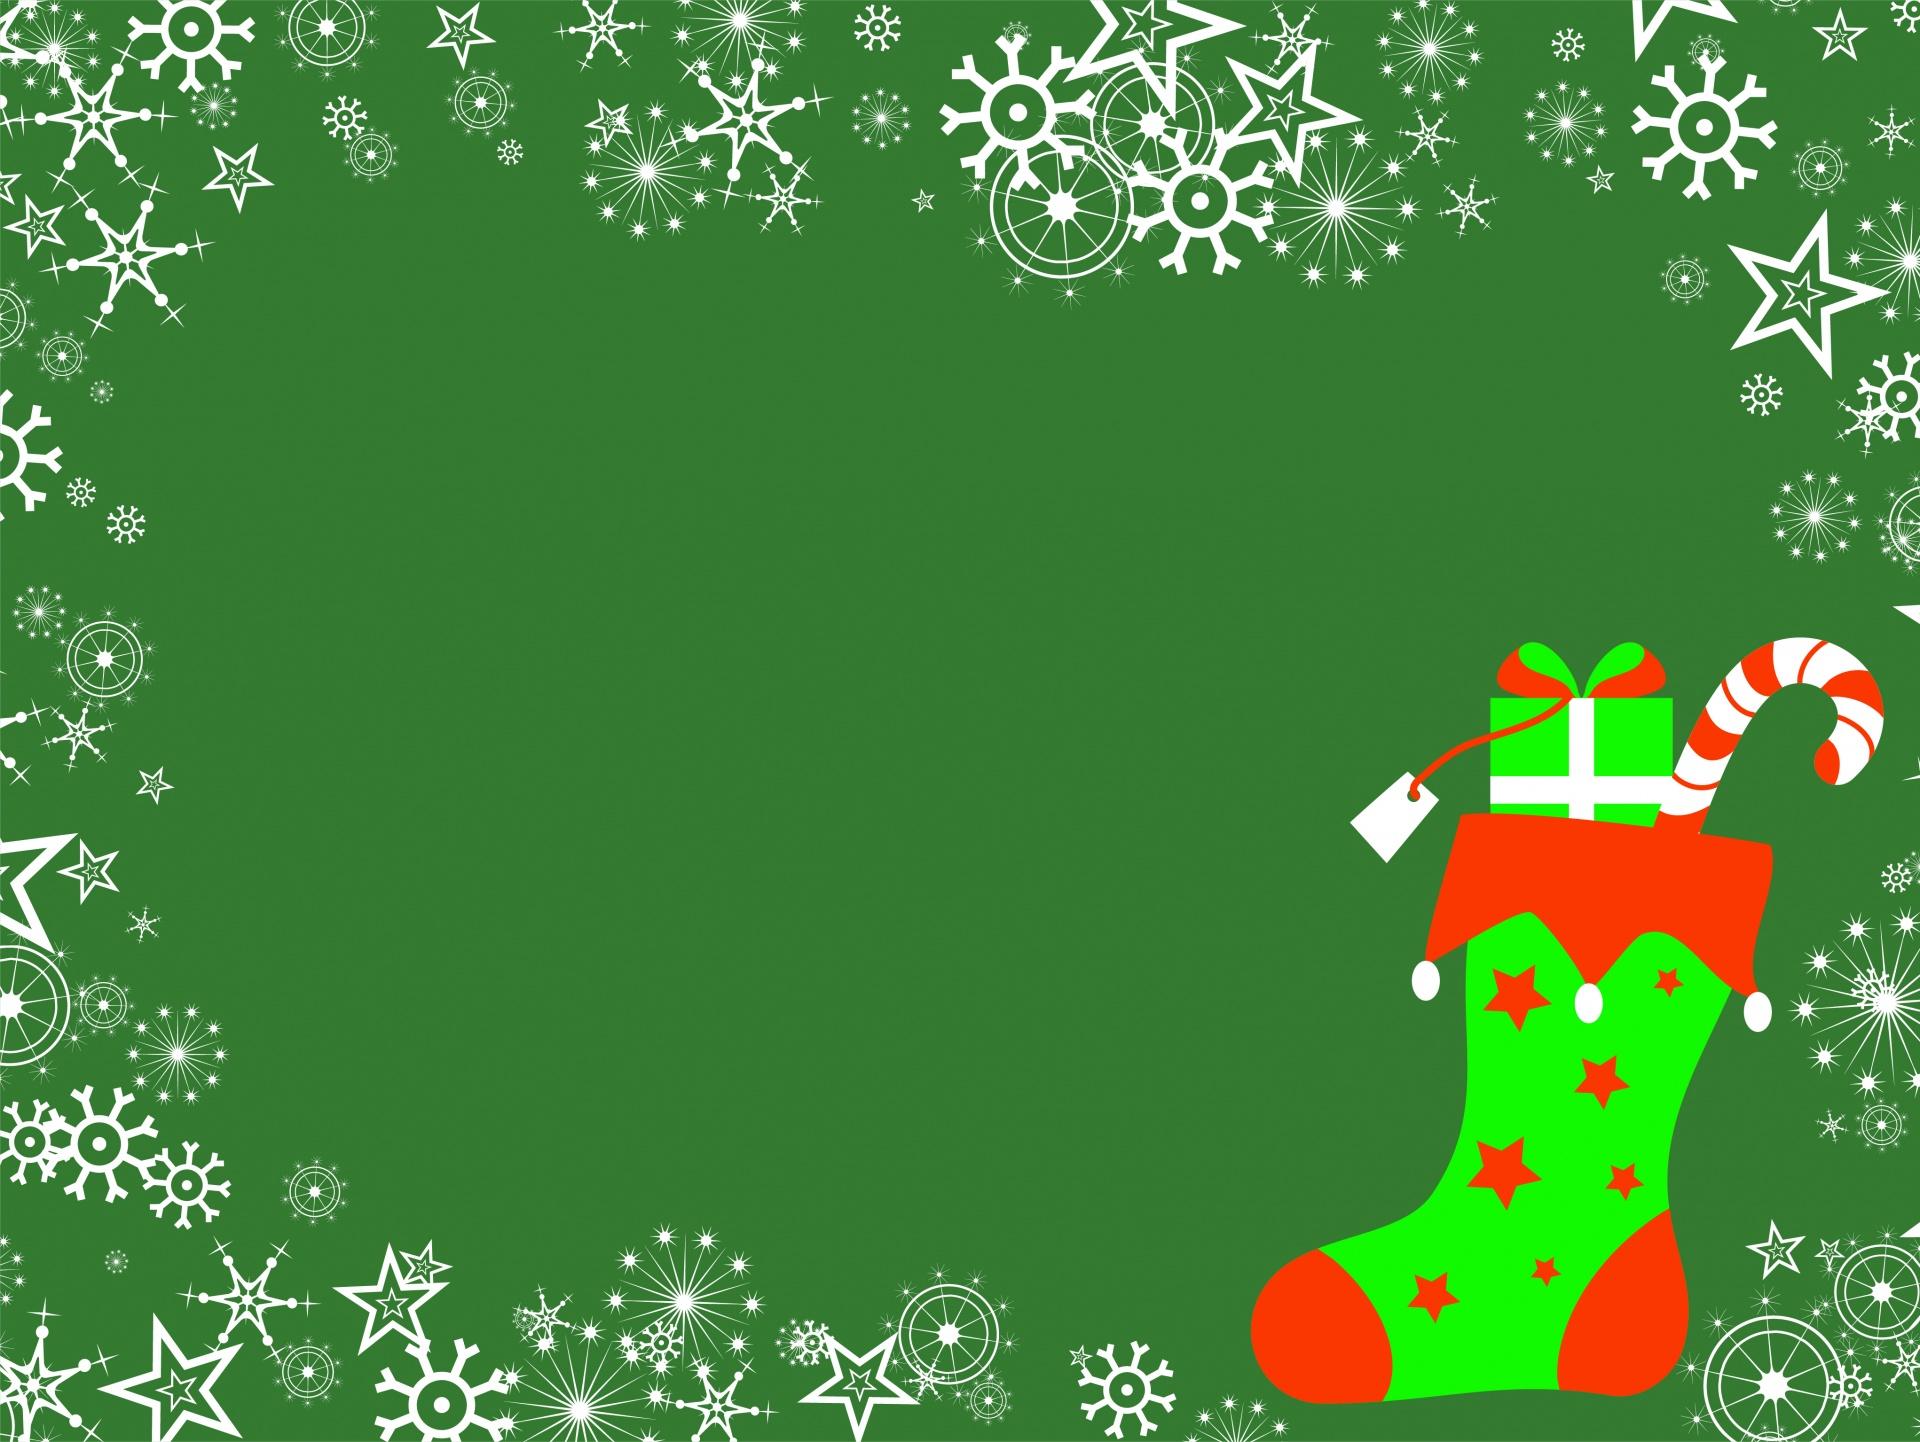 Christmas Stocking Free Stock Photo Public Domain Pictures